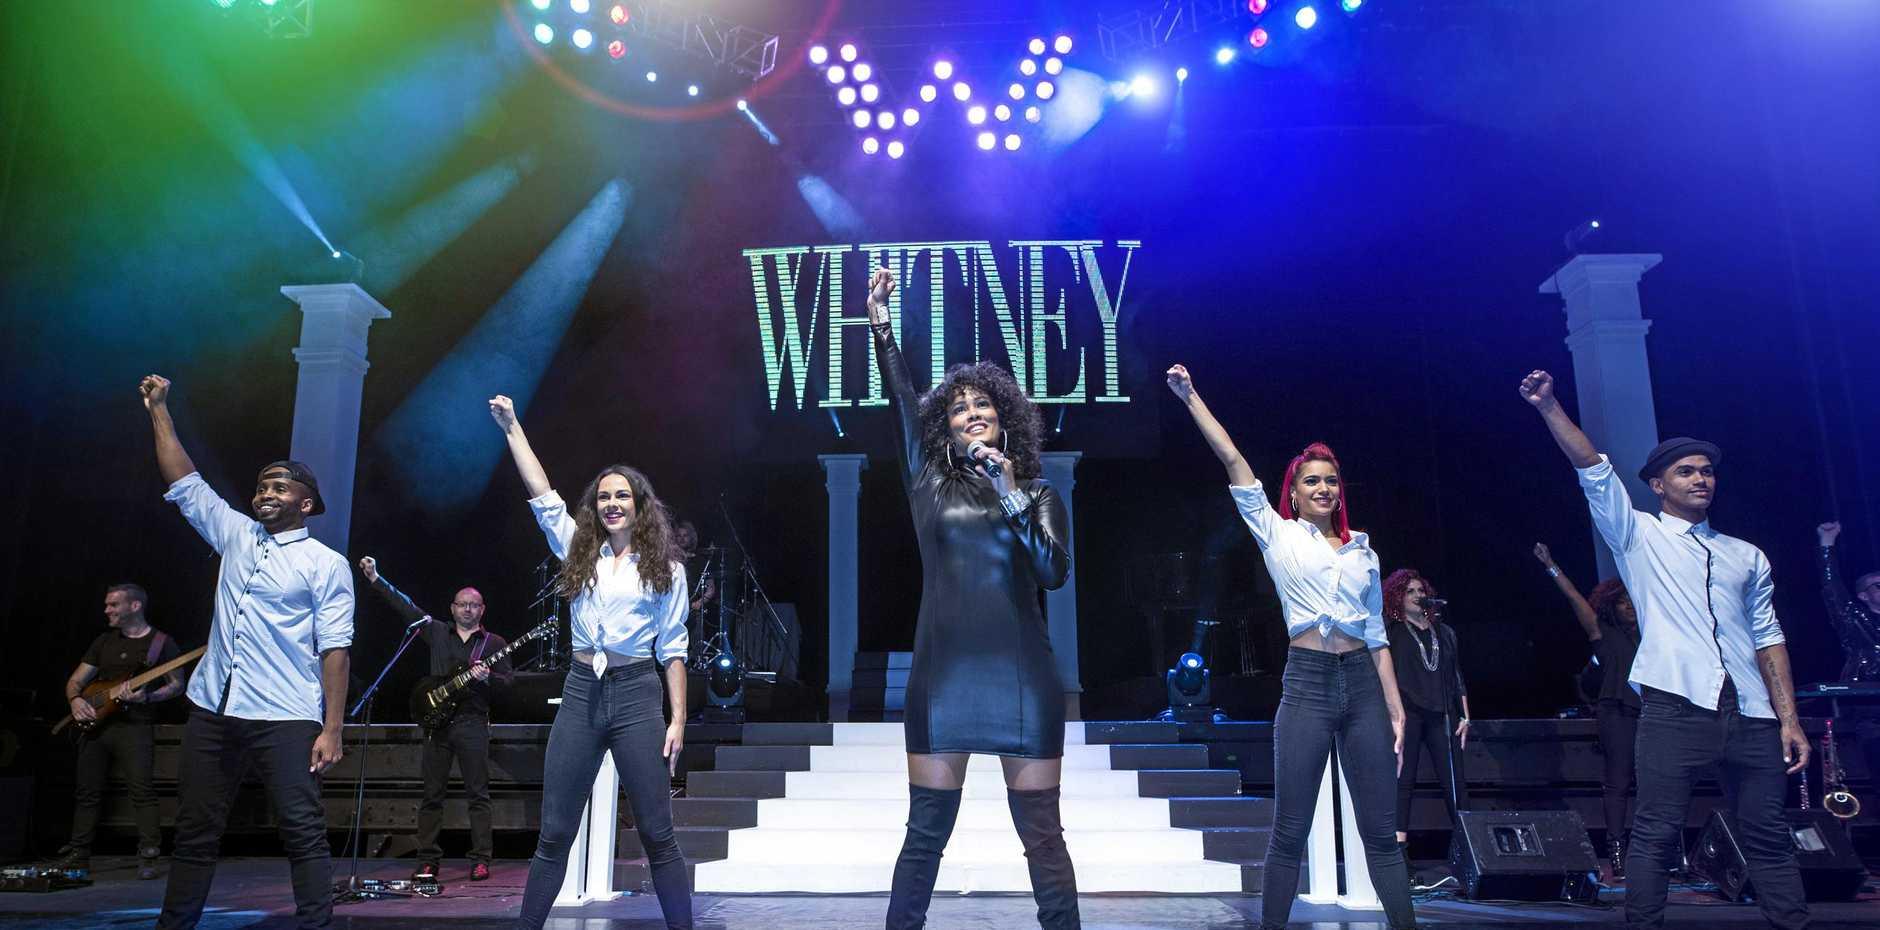 TRIBUTE SHOW: Showtime Australia is showcasing songstress Whitney Houston, through the breathtaking vocals of Belinda Davids.